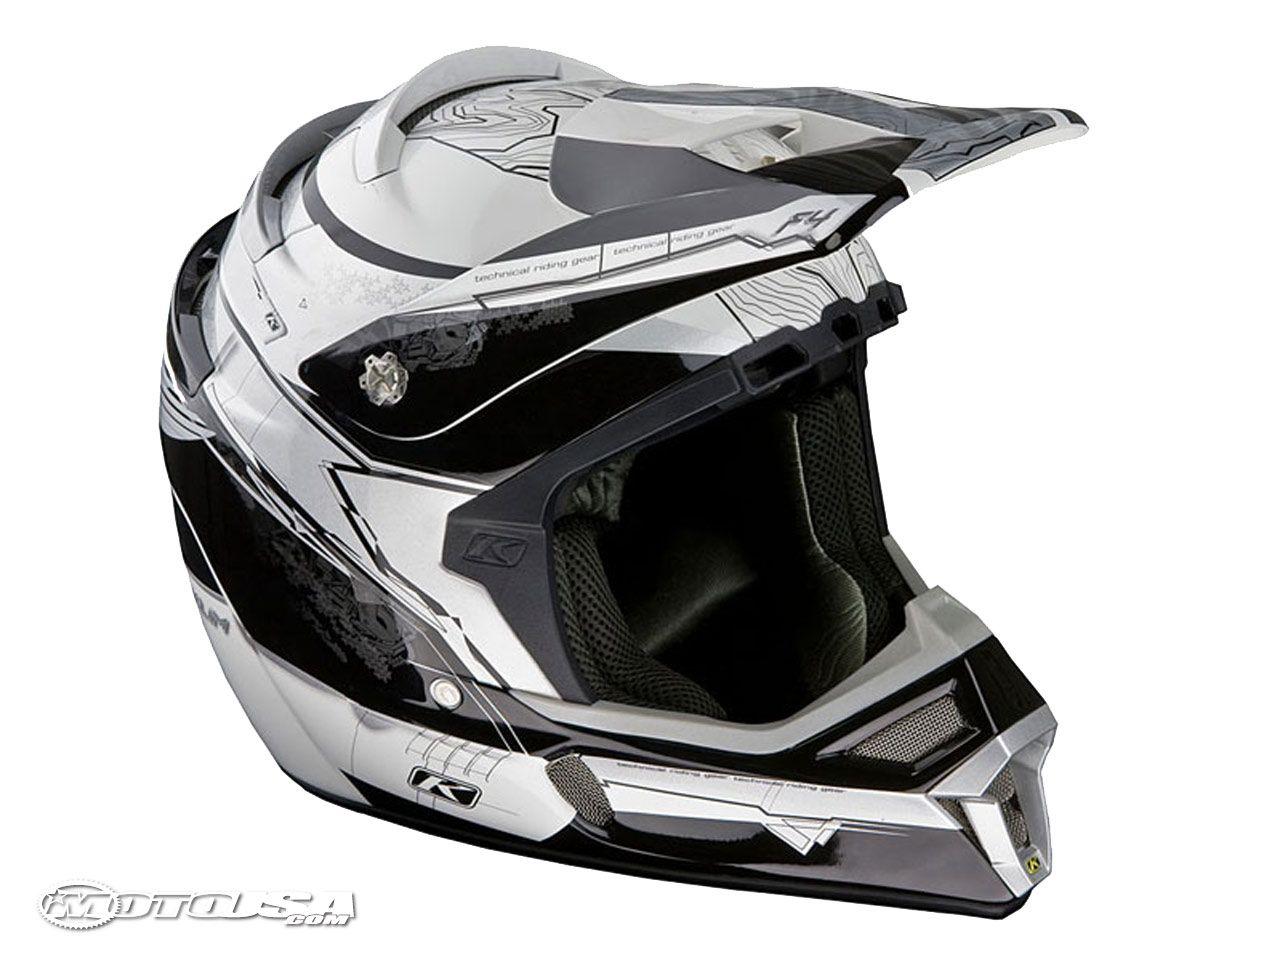 Klim F4 Helmet Review